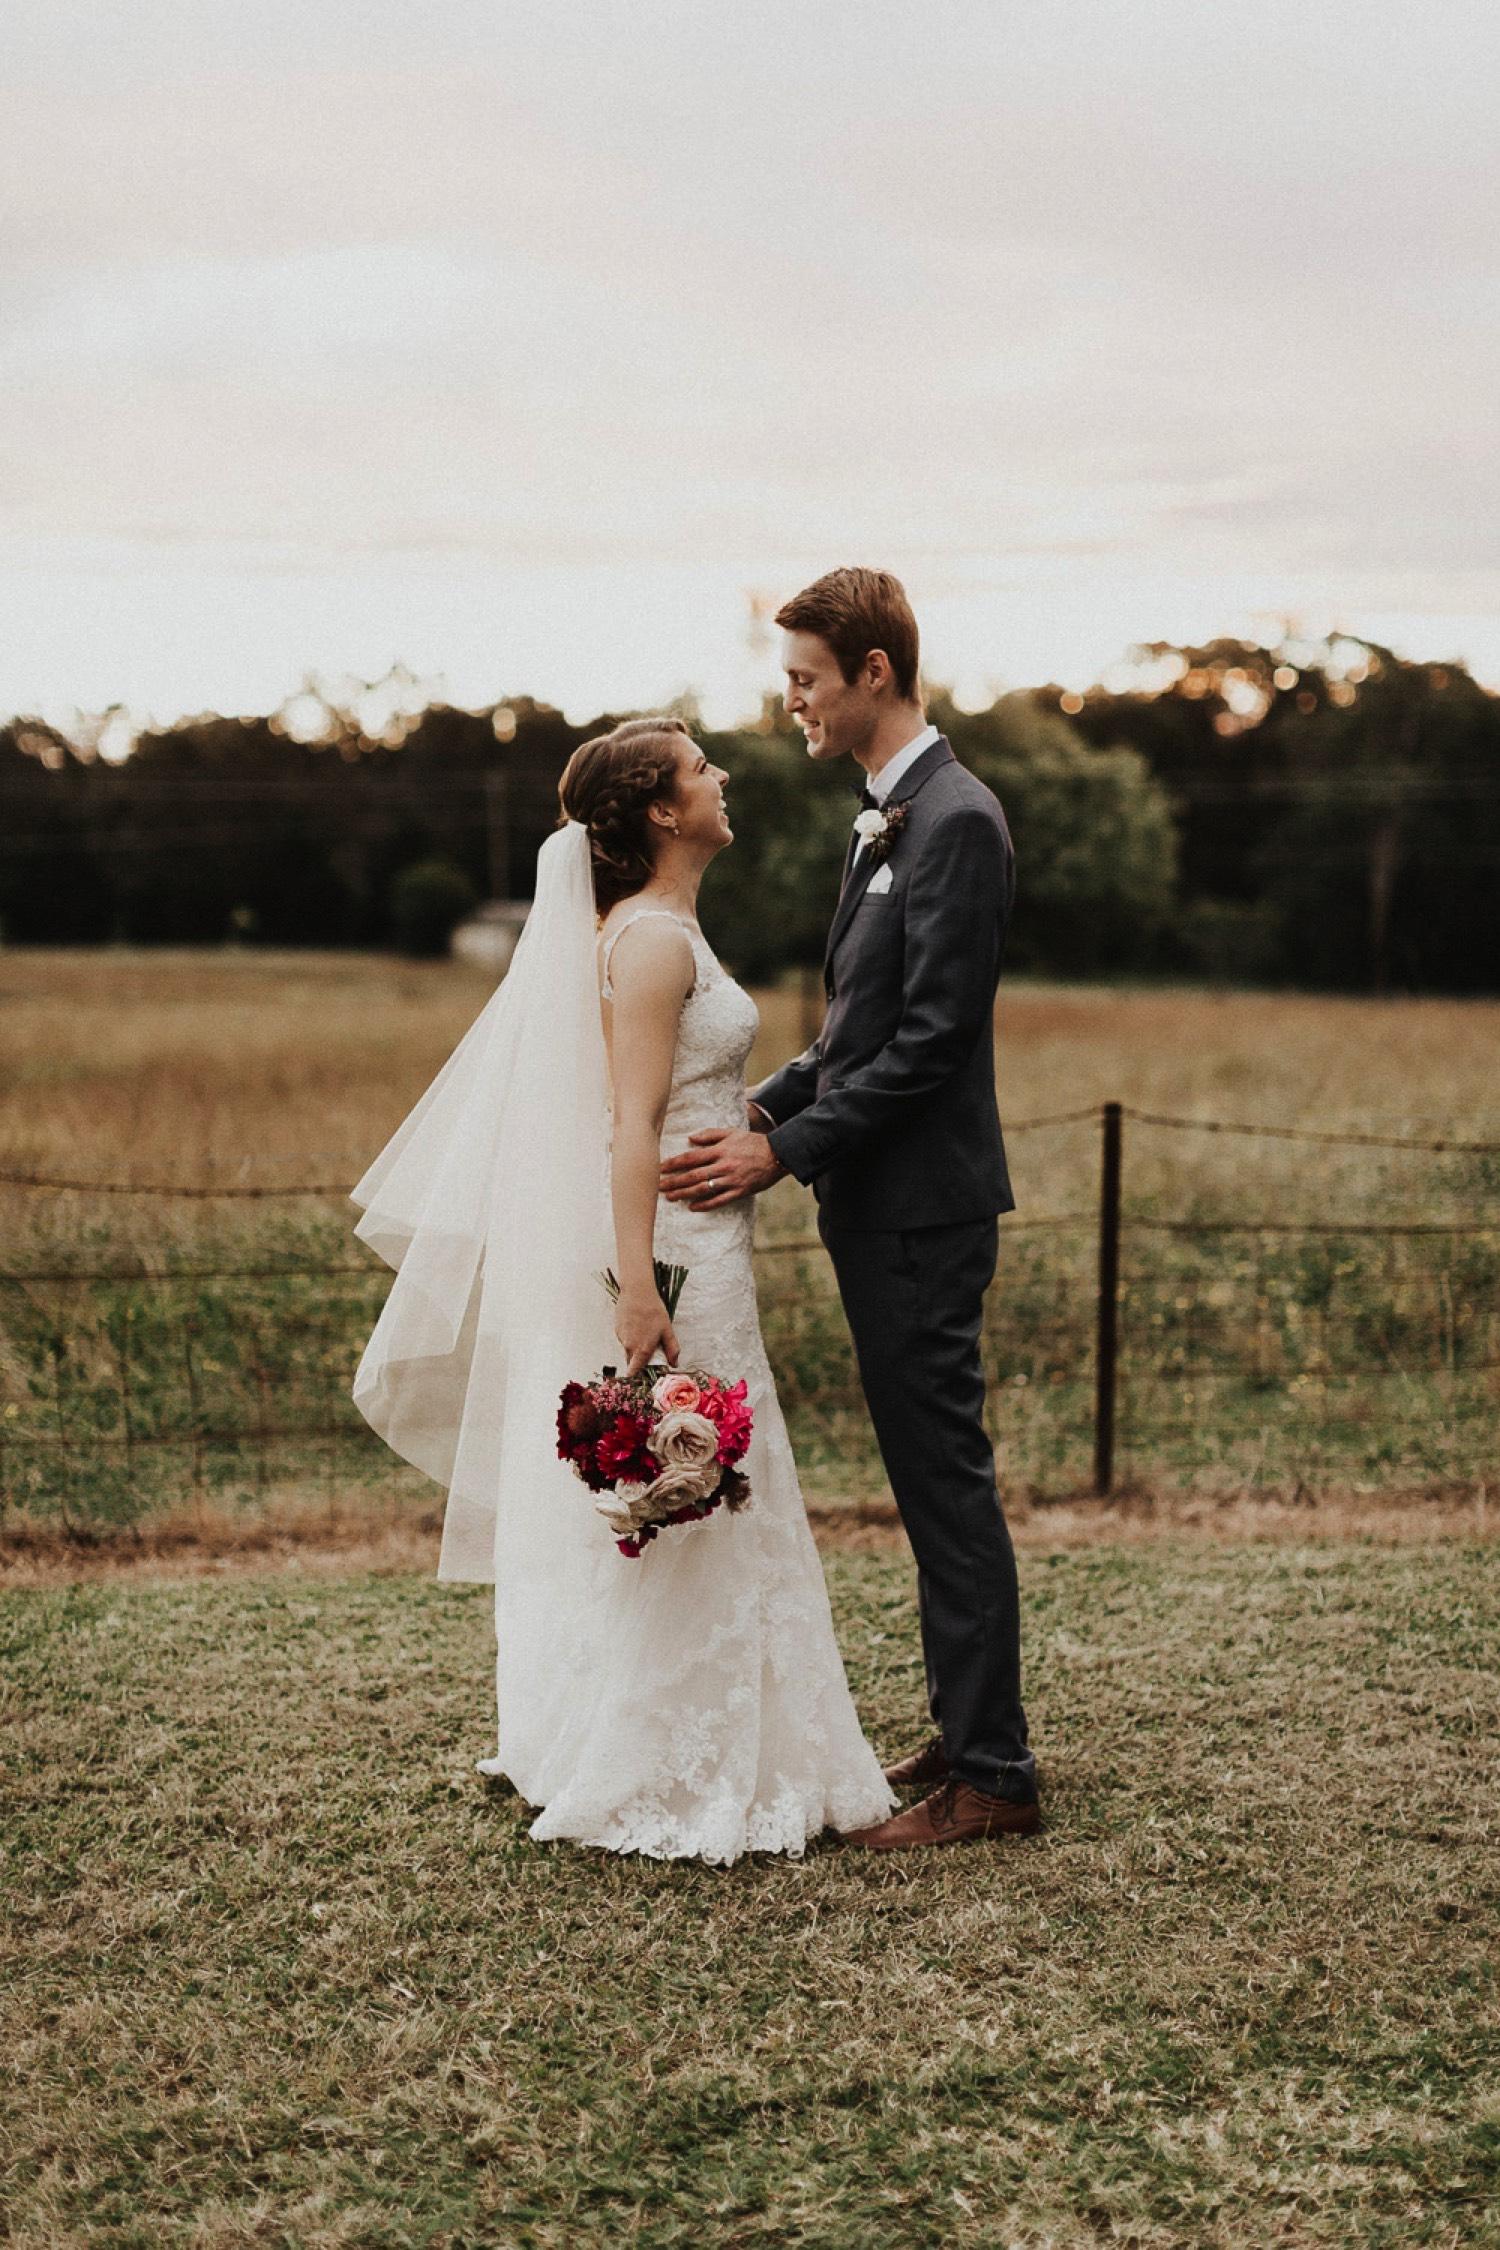 Rustic Country Wedding Photography 75.jpg